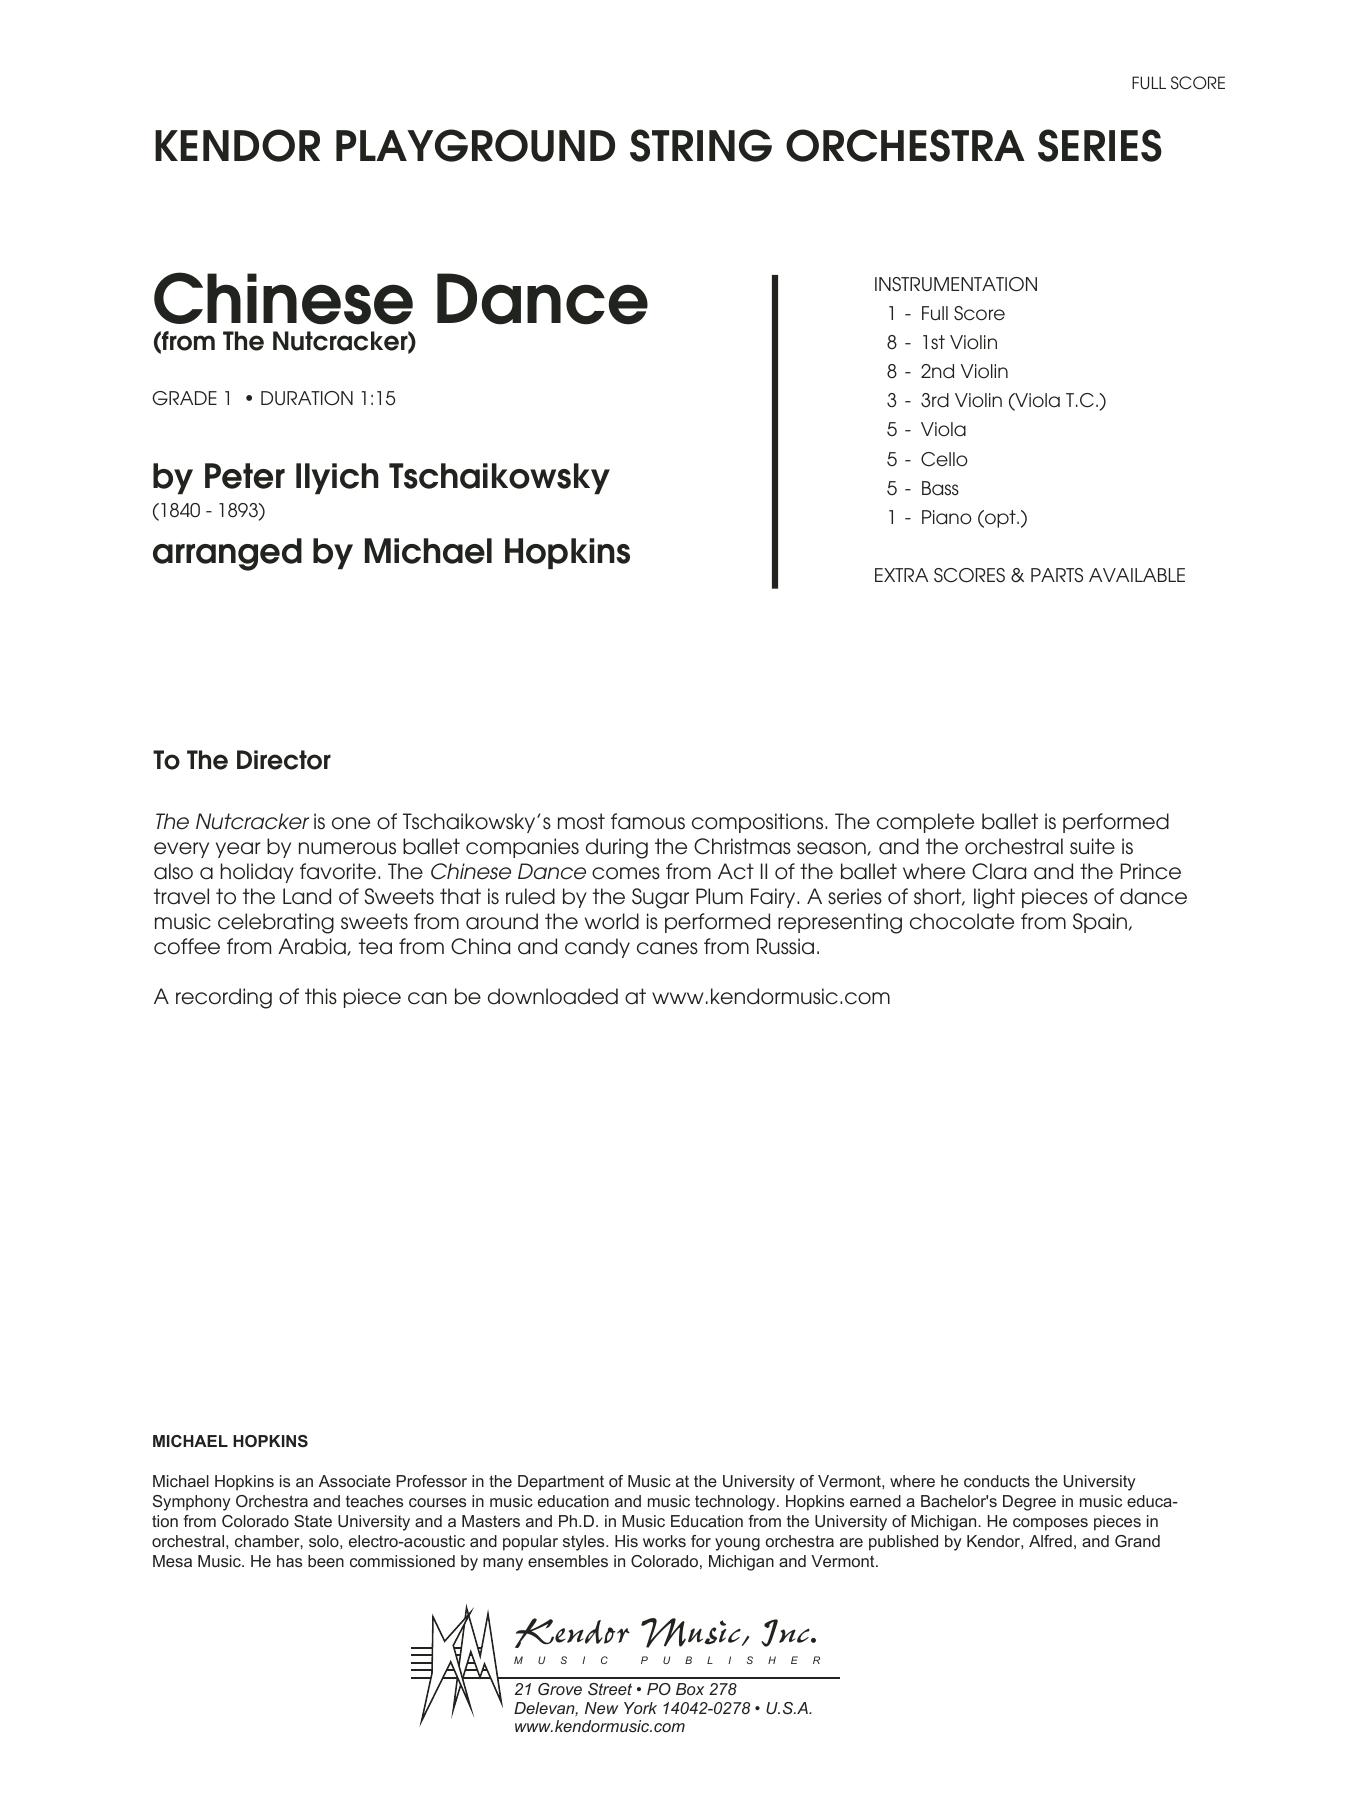 Chinese Dance (from The Nutcracker) - Full Score Sheet Music